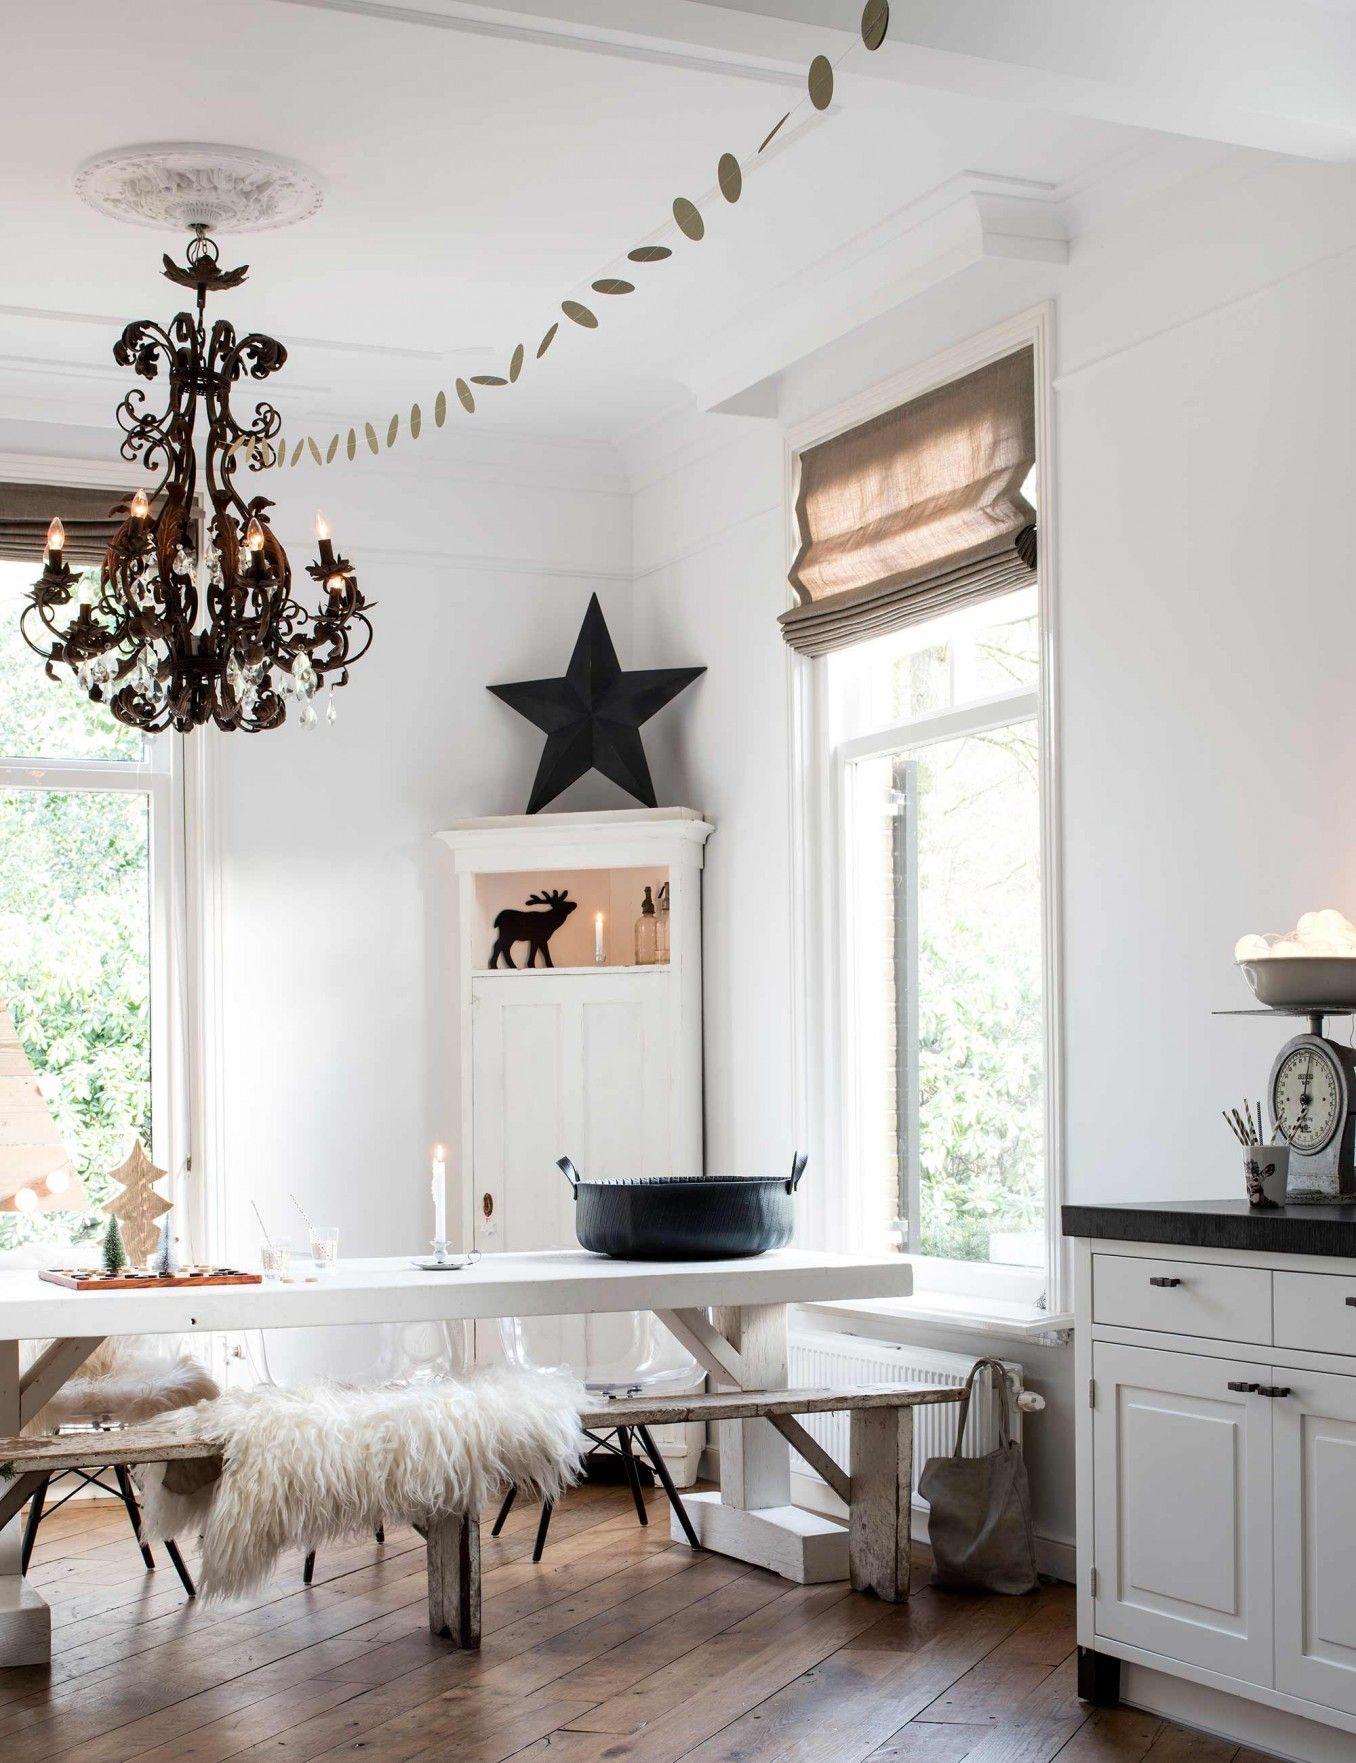 weihnachten in holland lilaliv s e a s o n m o o d x m a s pinterest weihnachten. Black Bedroom Furniture Sets. Home Design Ideas